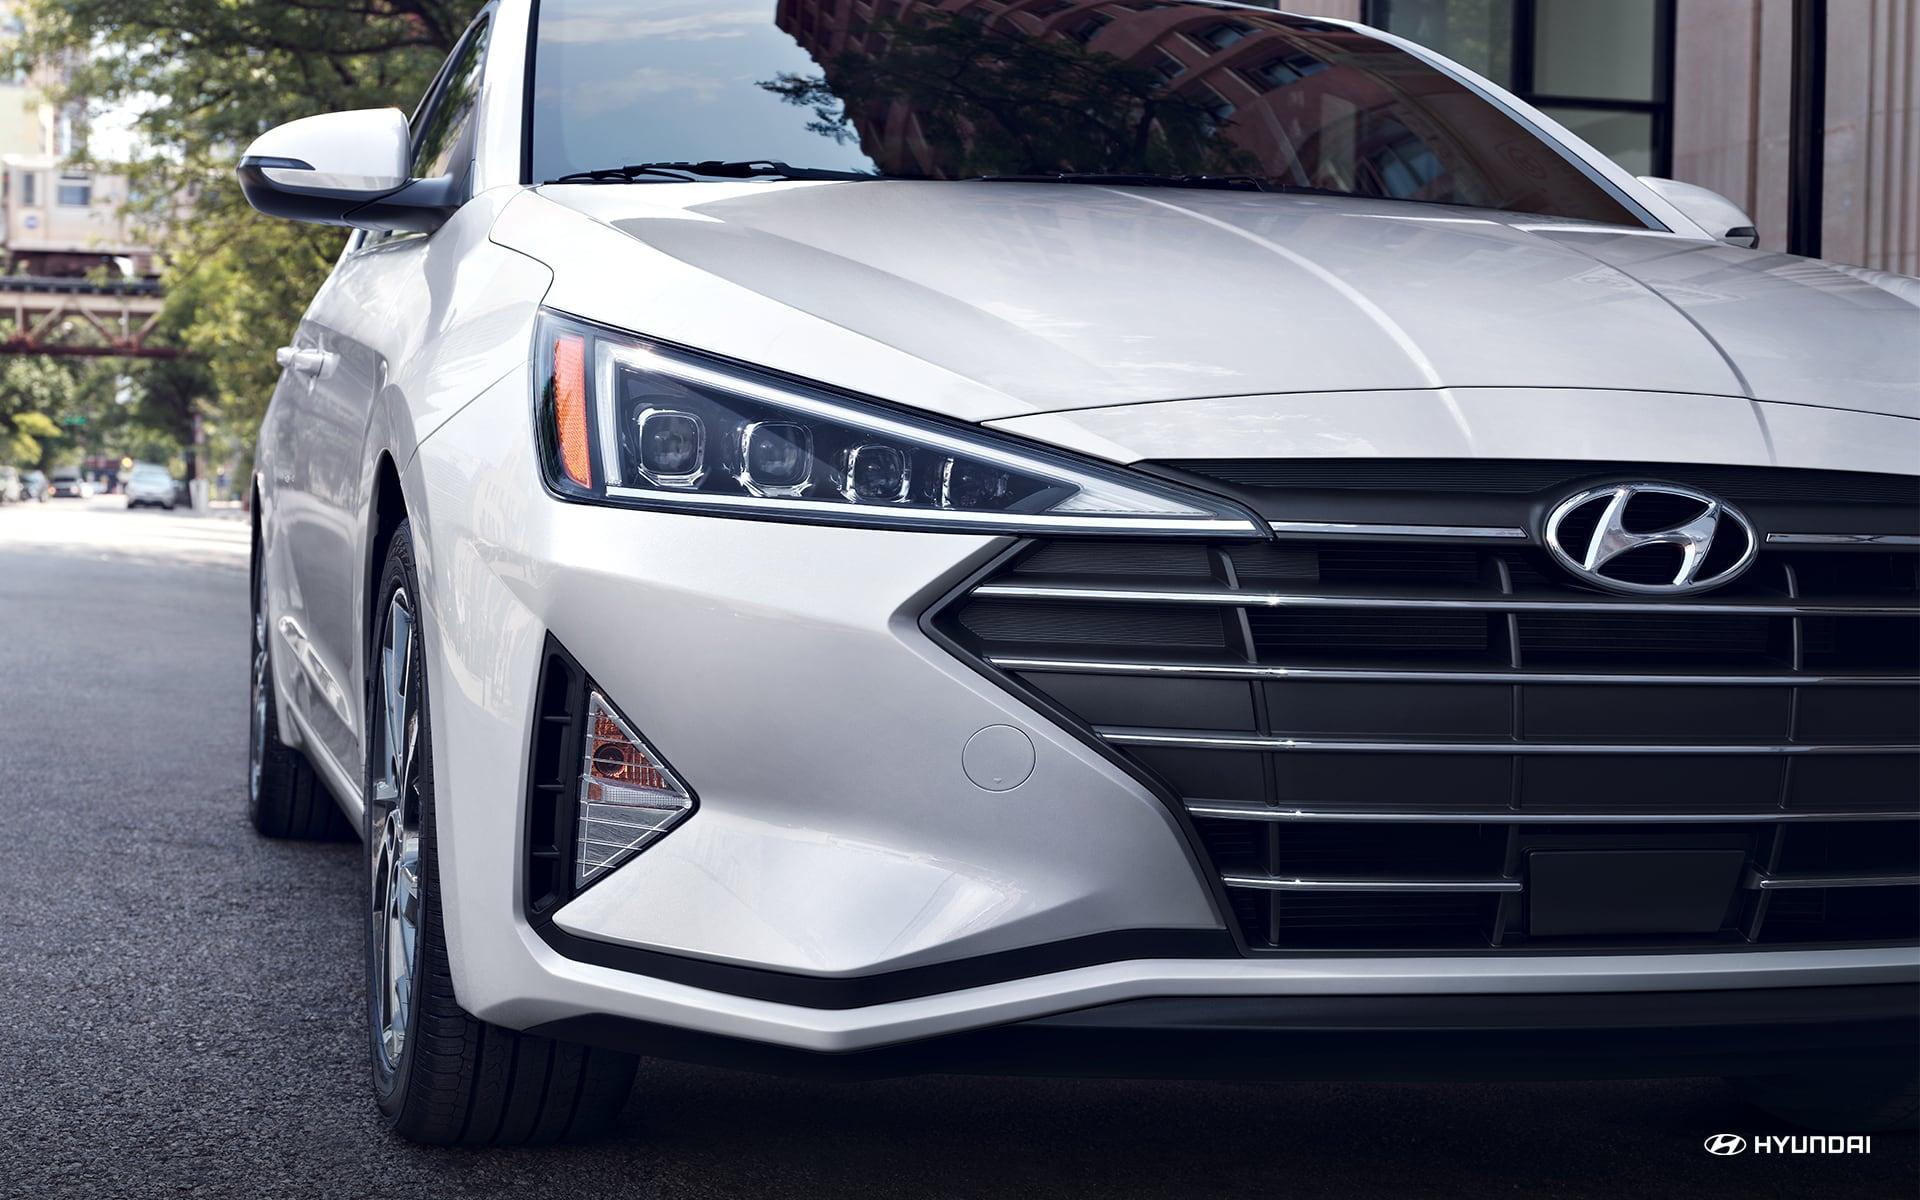 2020 Hyundai Elantra Safety